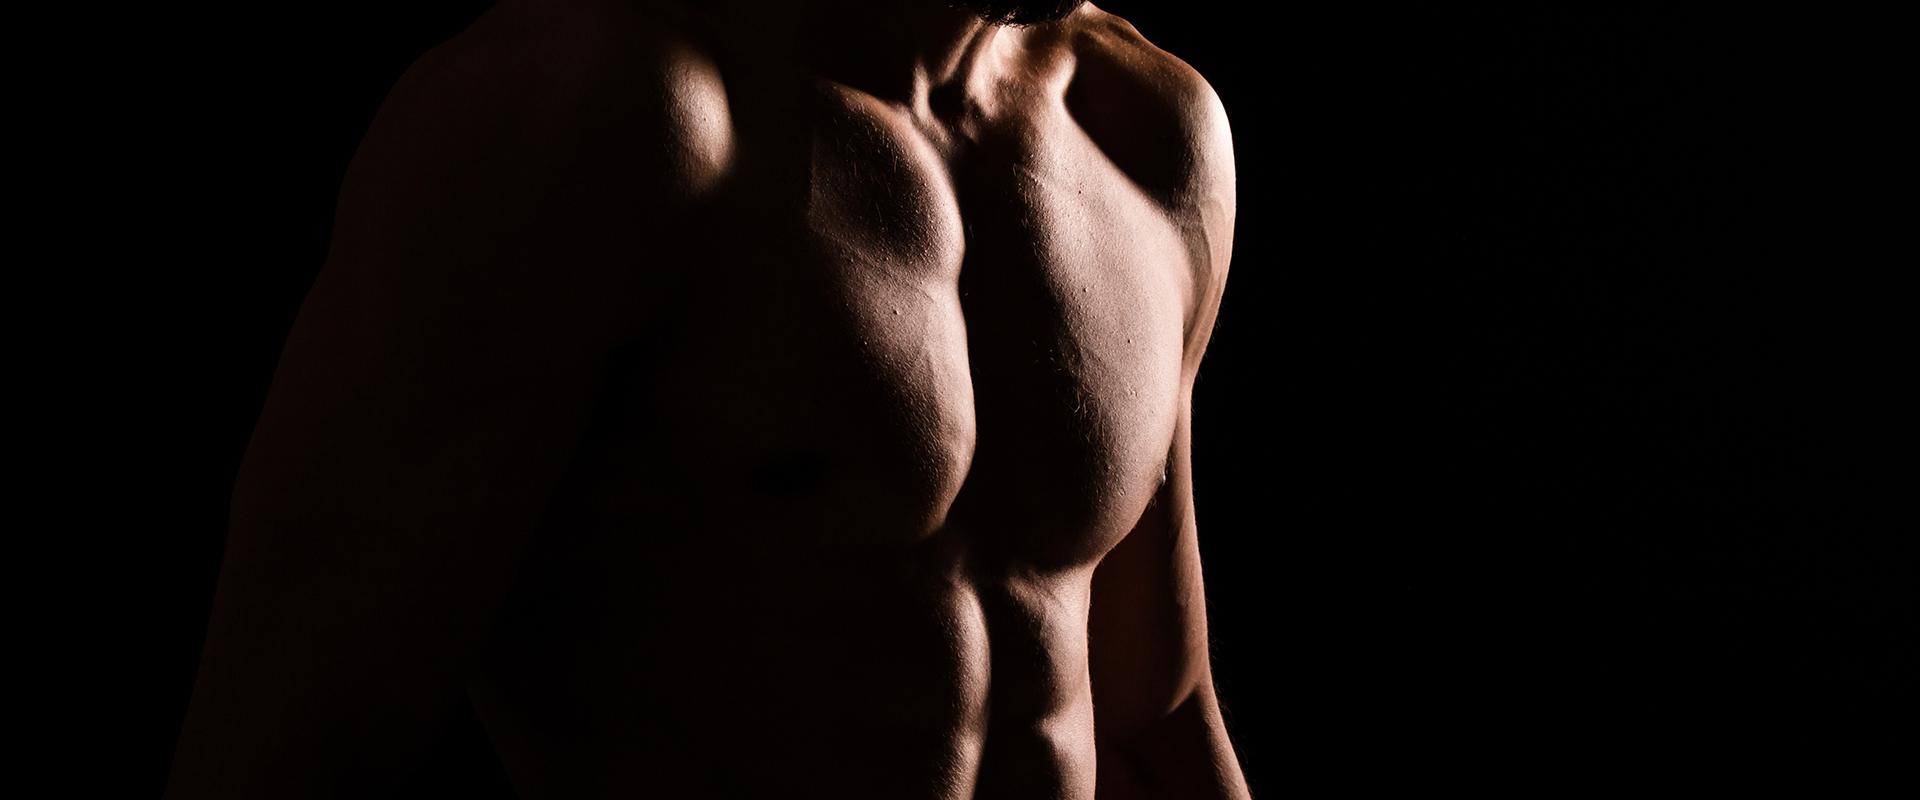 seksi tampere seuralaispalvelu miehille